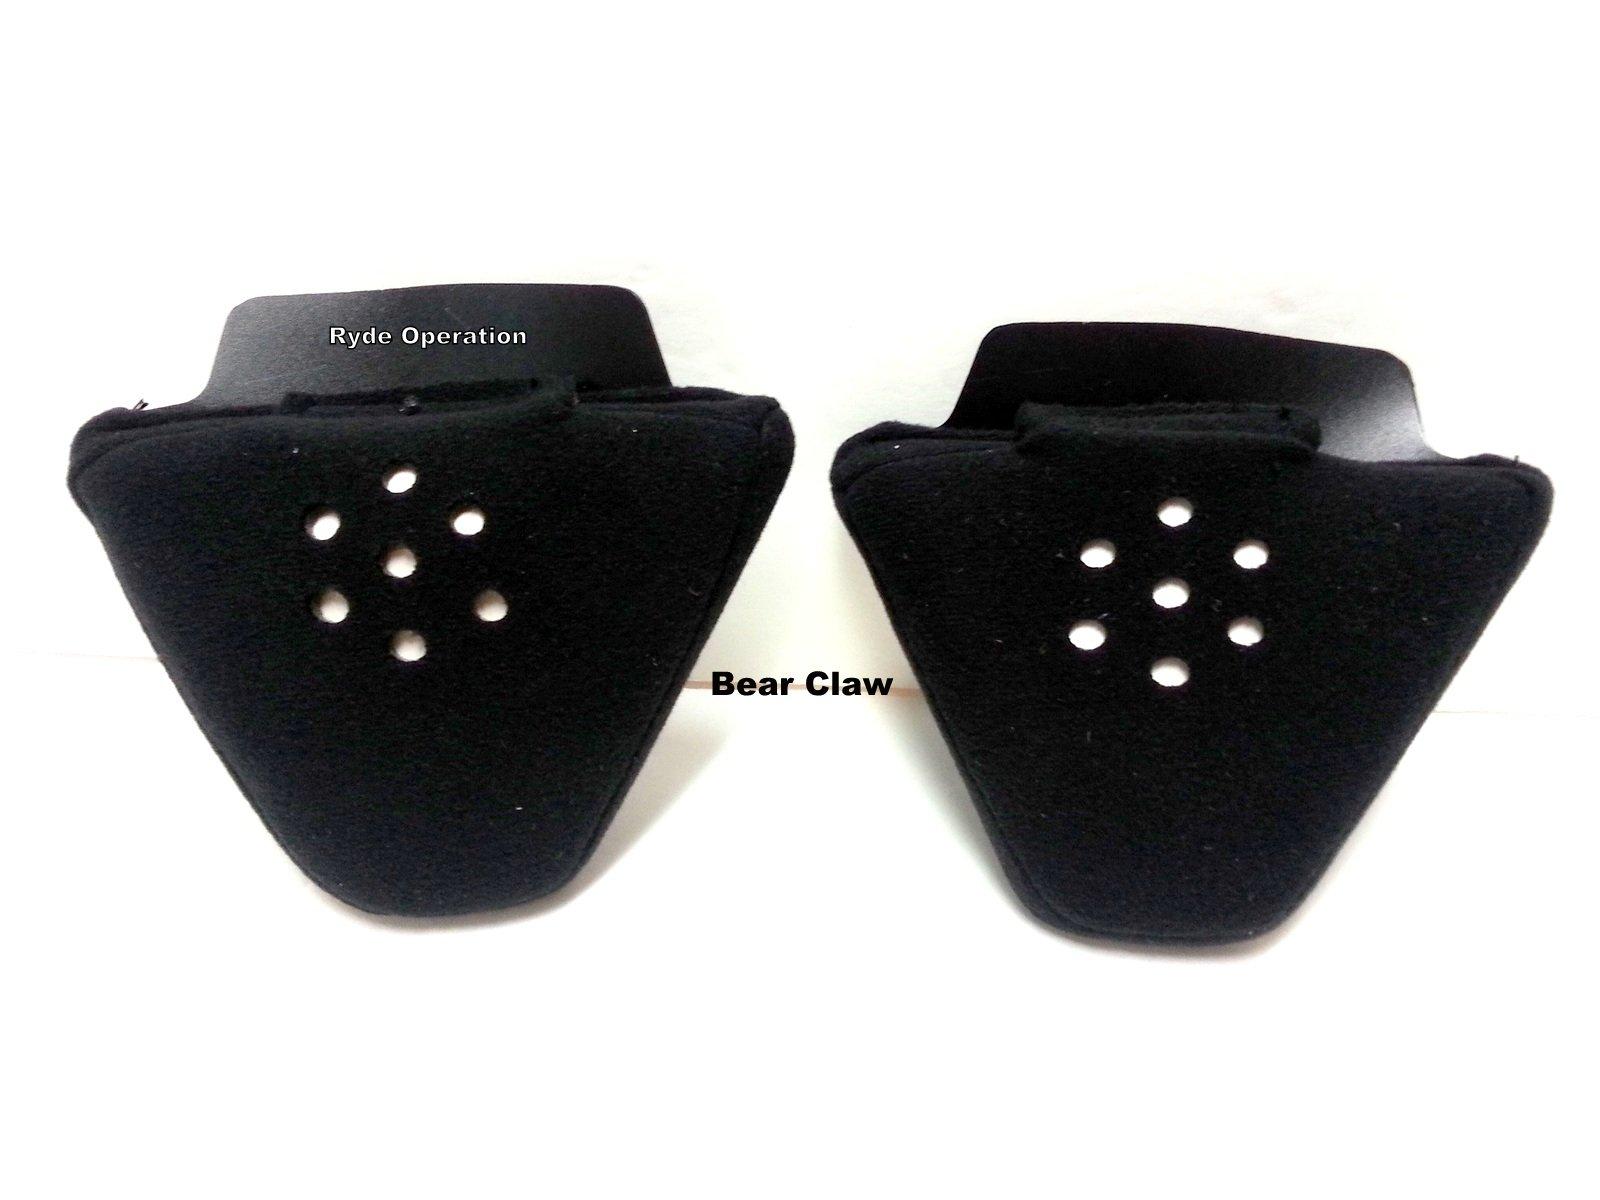 Audio - Ear Pad Inserts - No Wind Noise - Stay Wam - Speaker Ready - Bear Claw MC-AEP